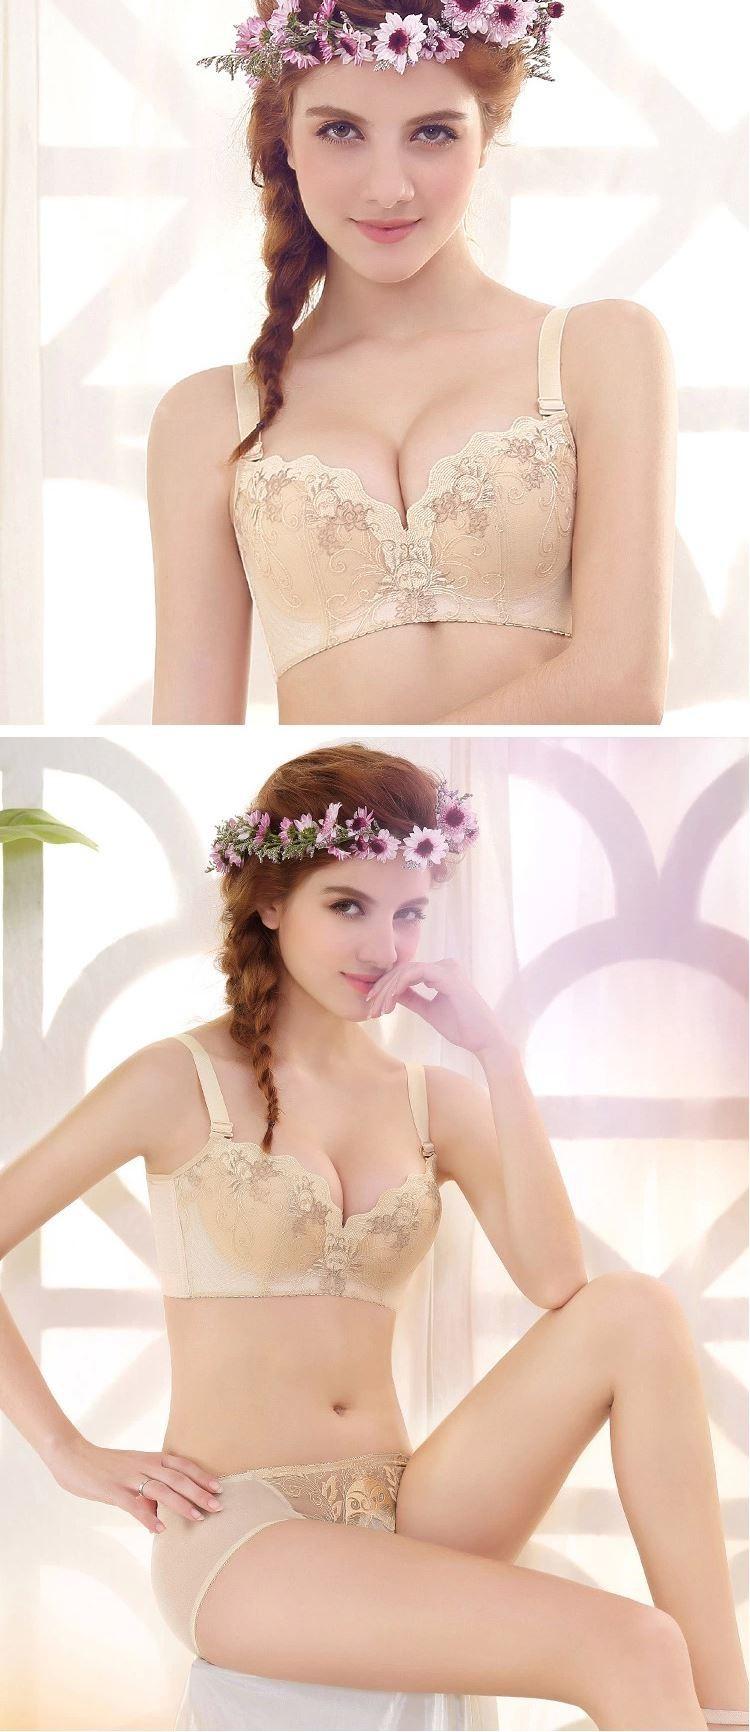 32a6e93b218 Free shipping 2014 sexy cute full cup underwear bra set good gift ...